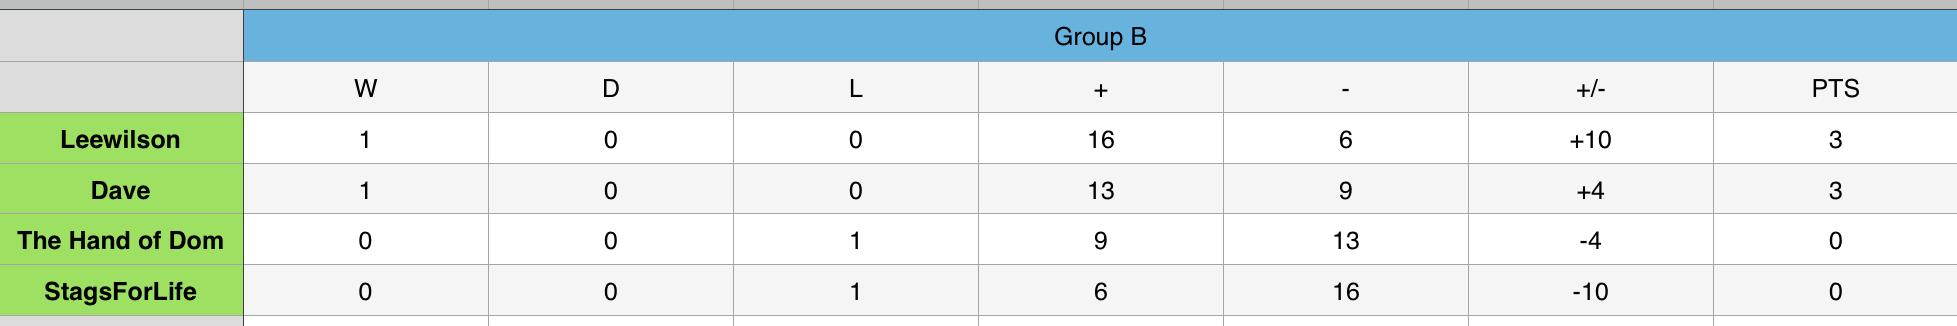 Group B.png